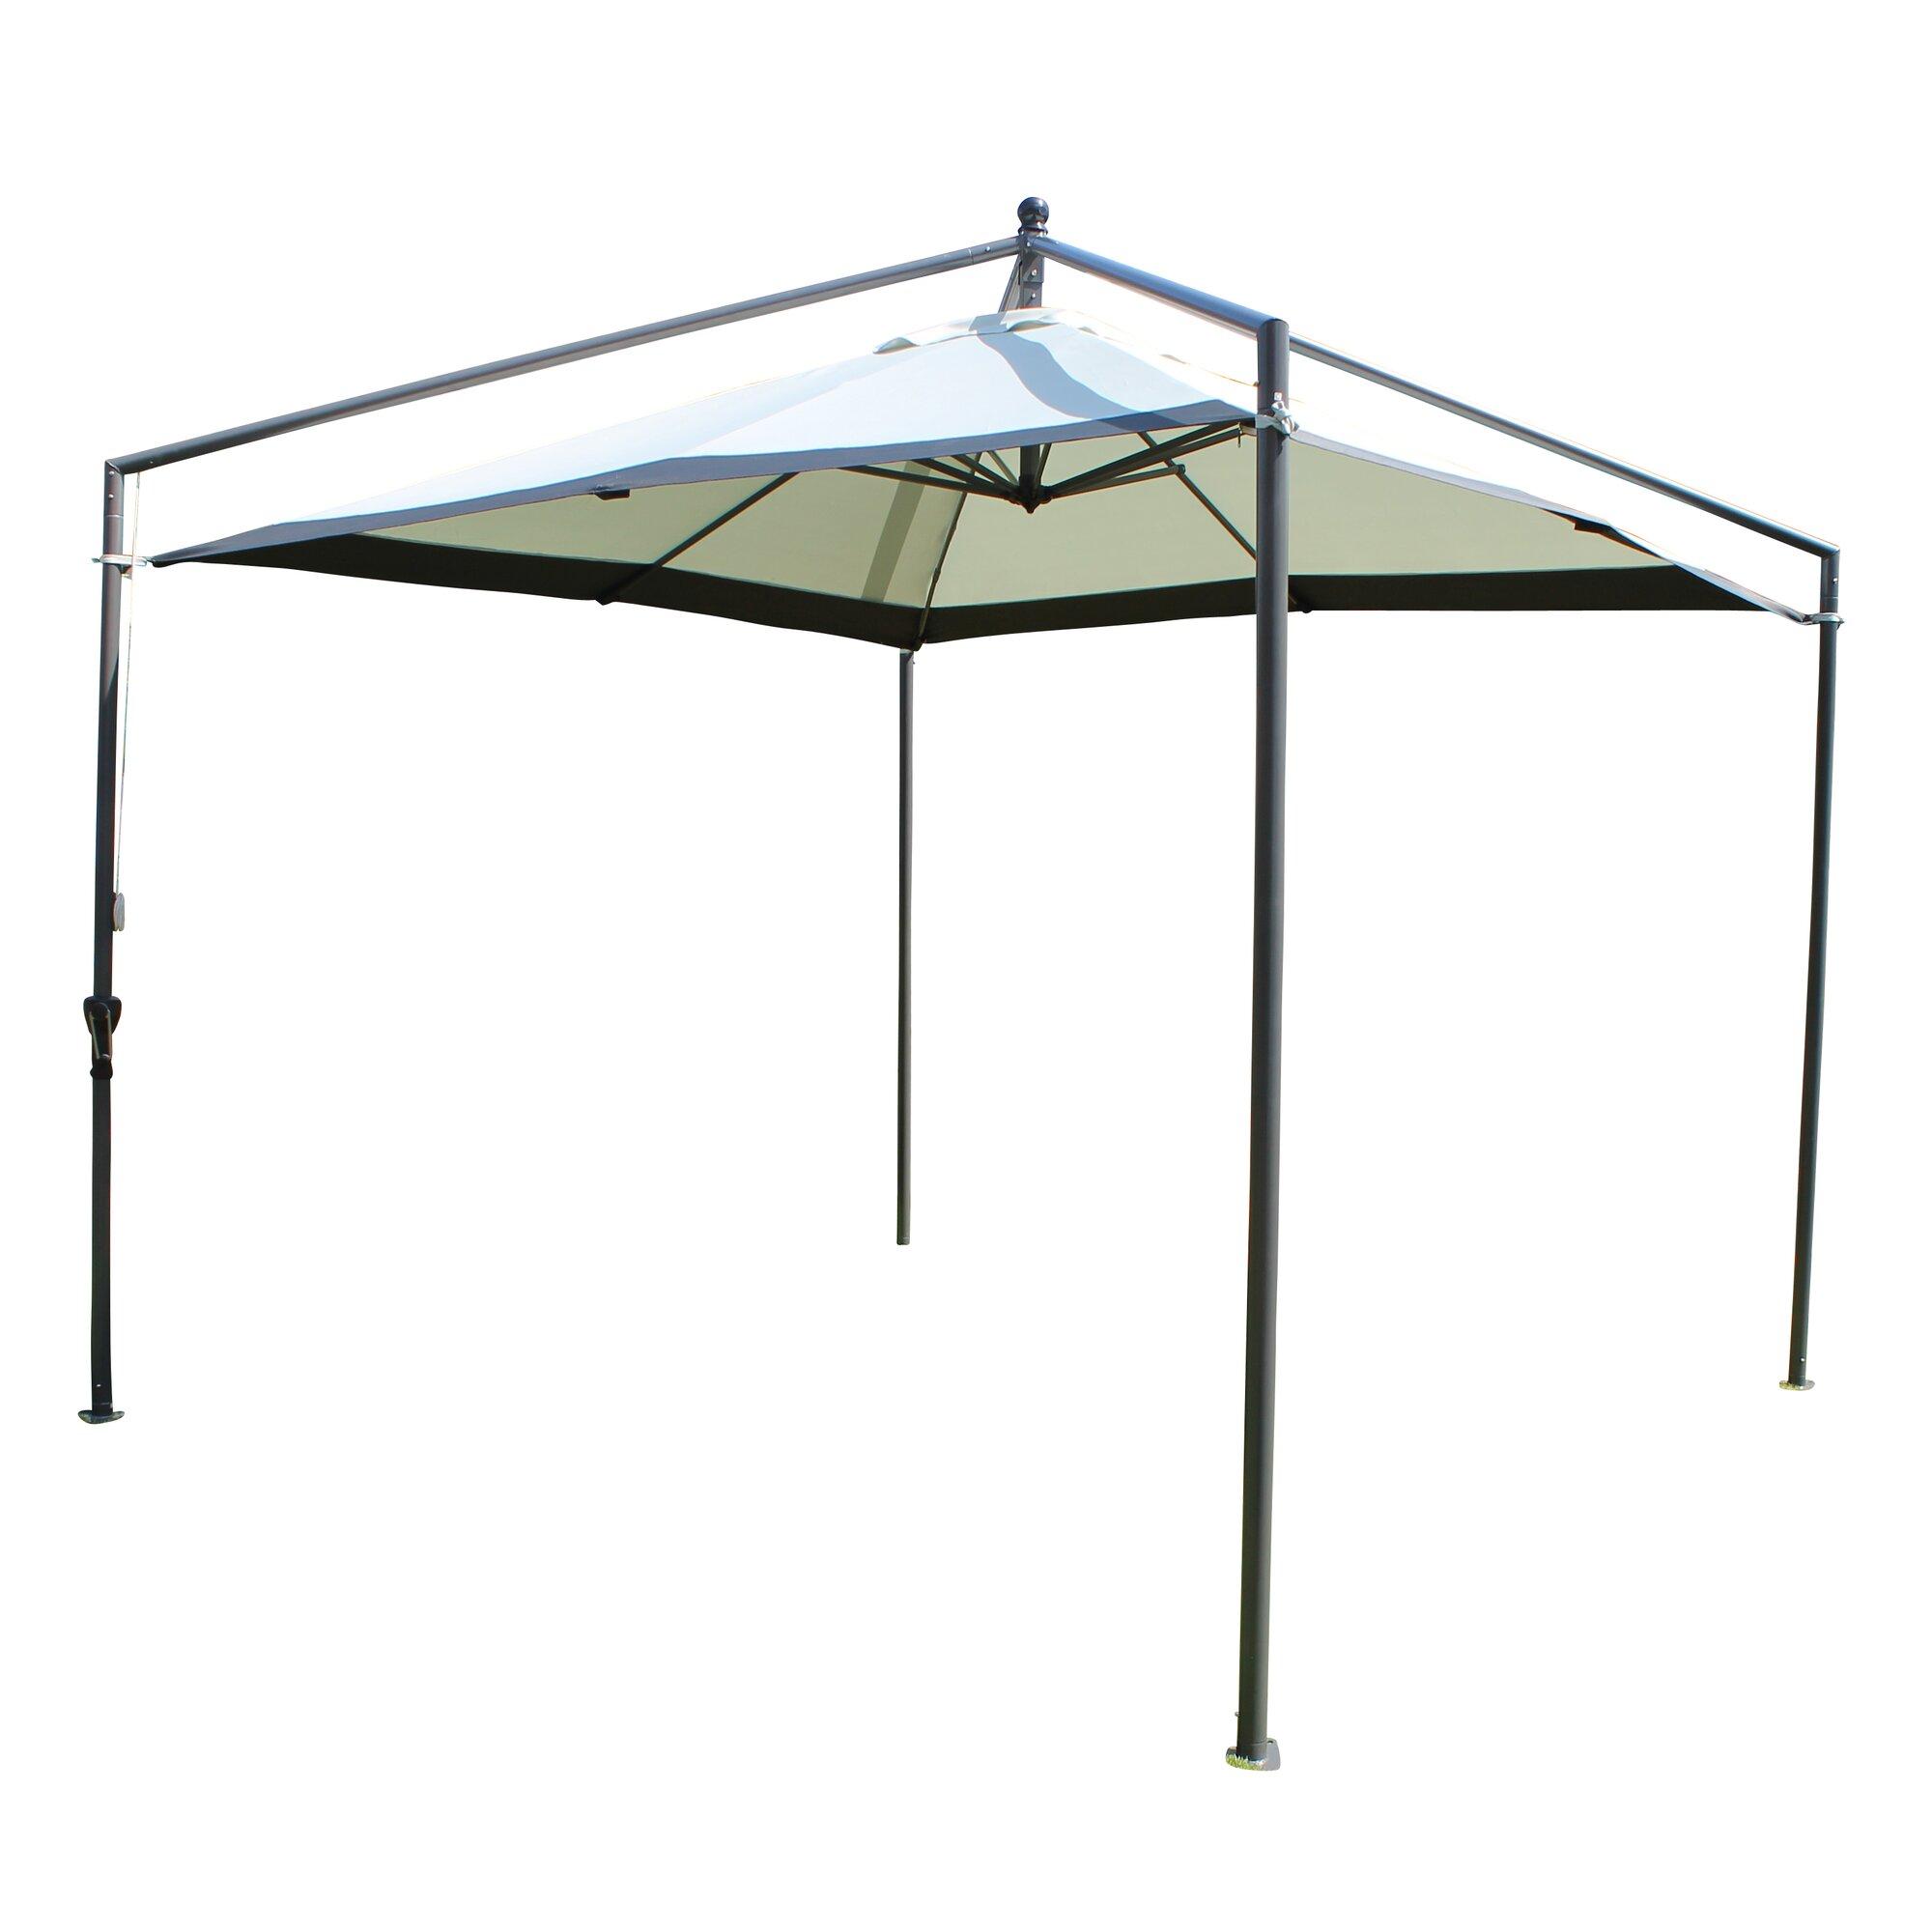 all home 3 m x 3 m pavillon aus metall. Black Bedroom Furniture Sets. Home Design Ideas